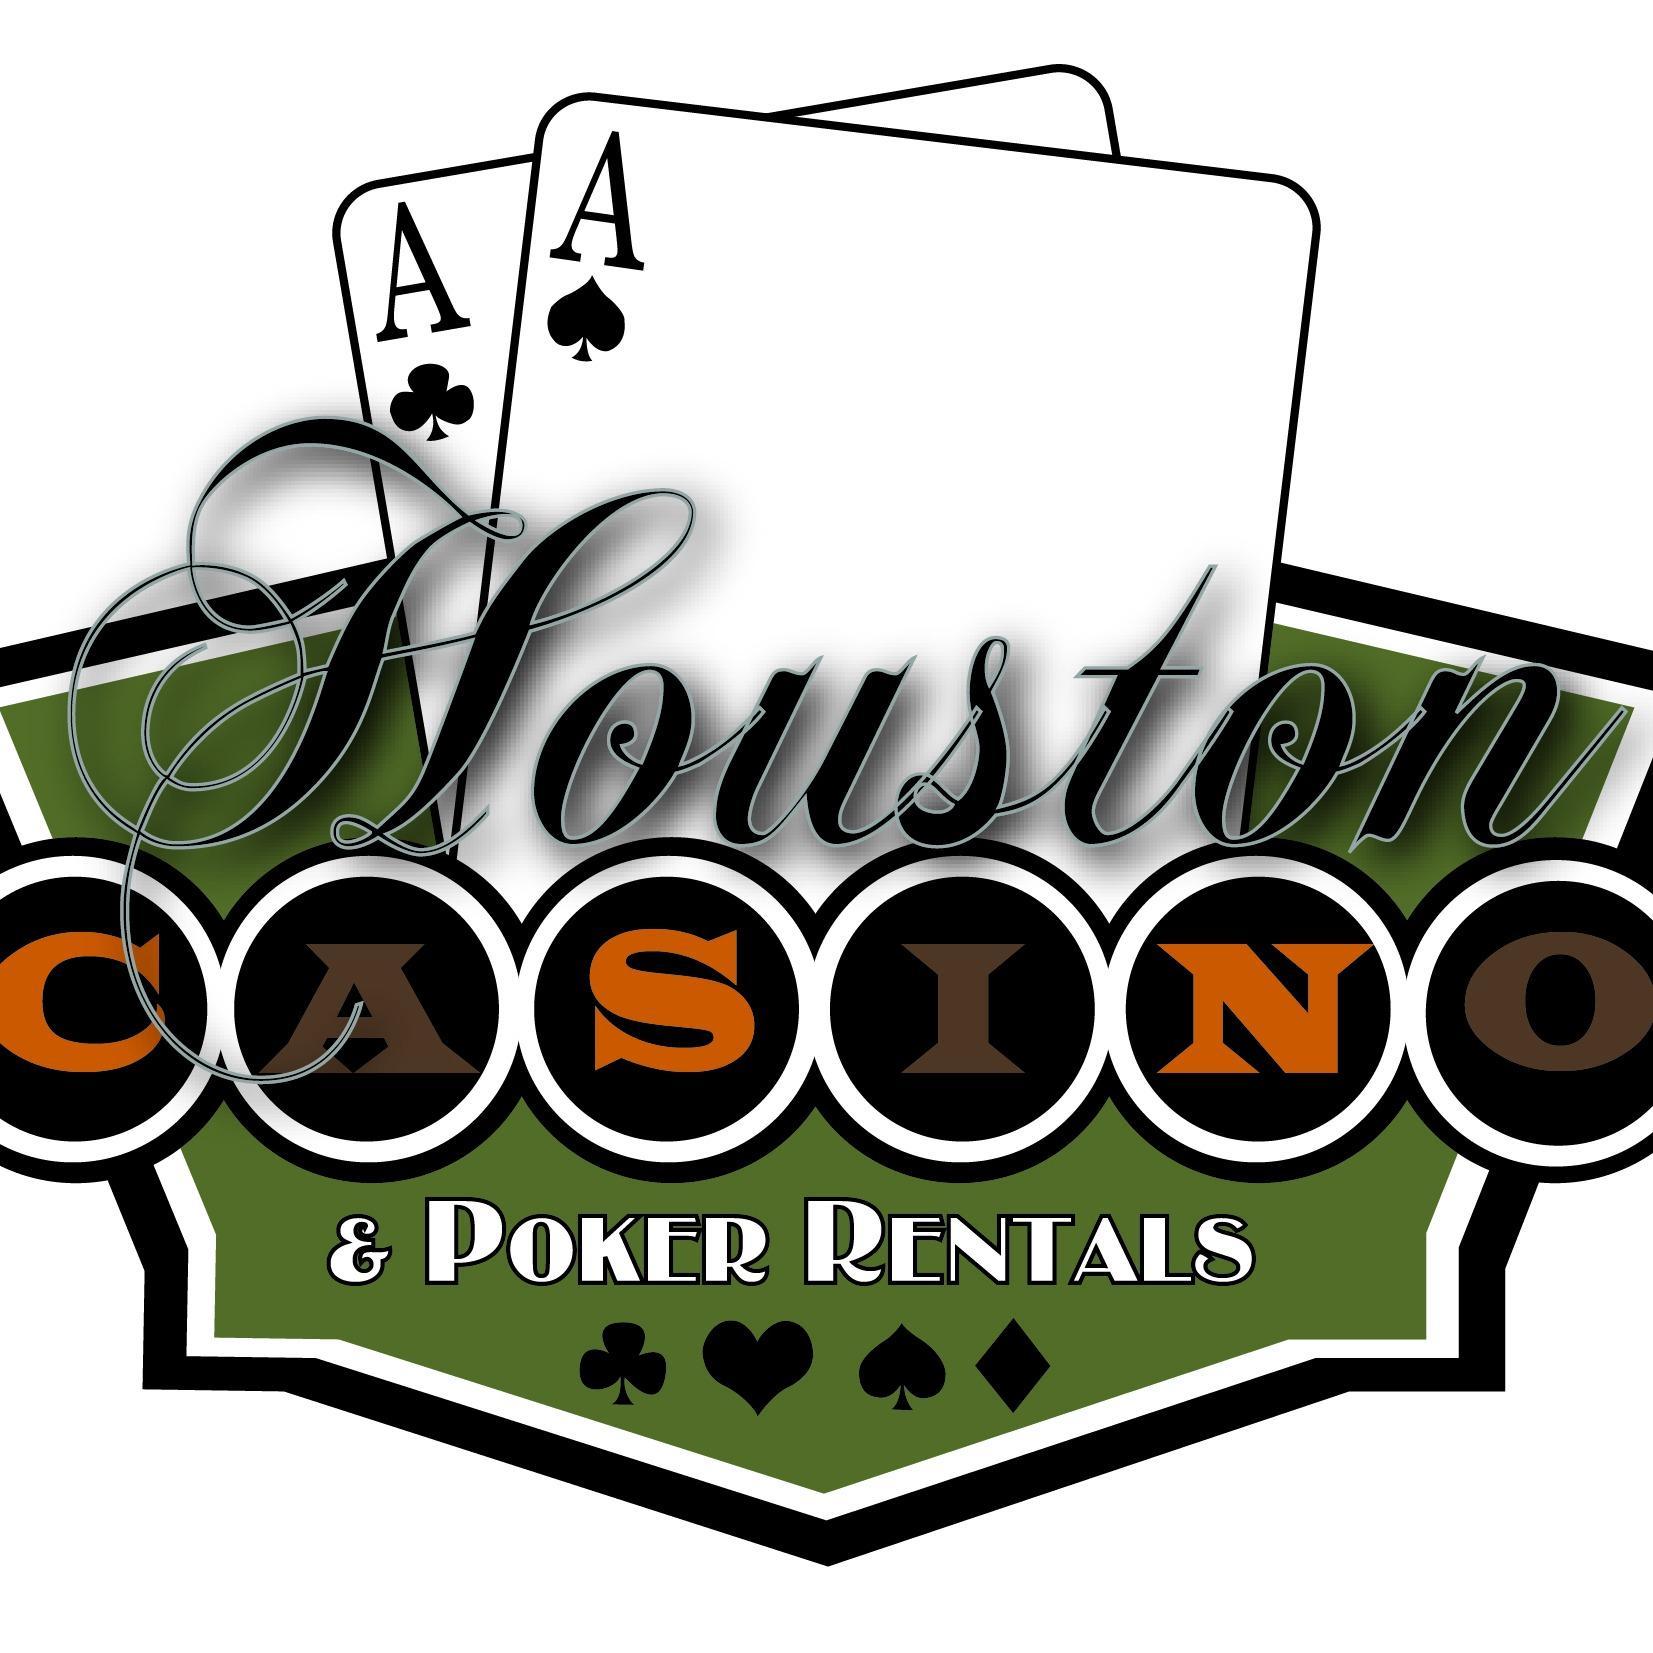 Houston Casino & Poker Rentals image 5